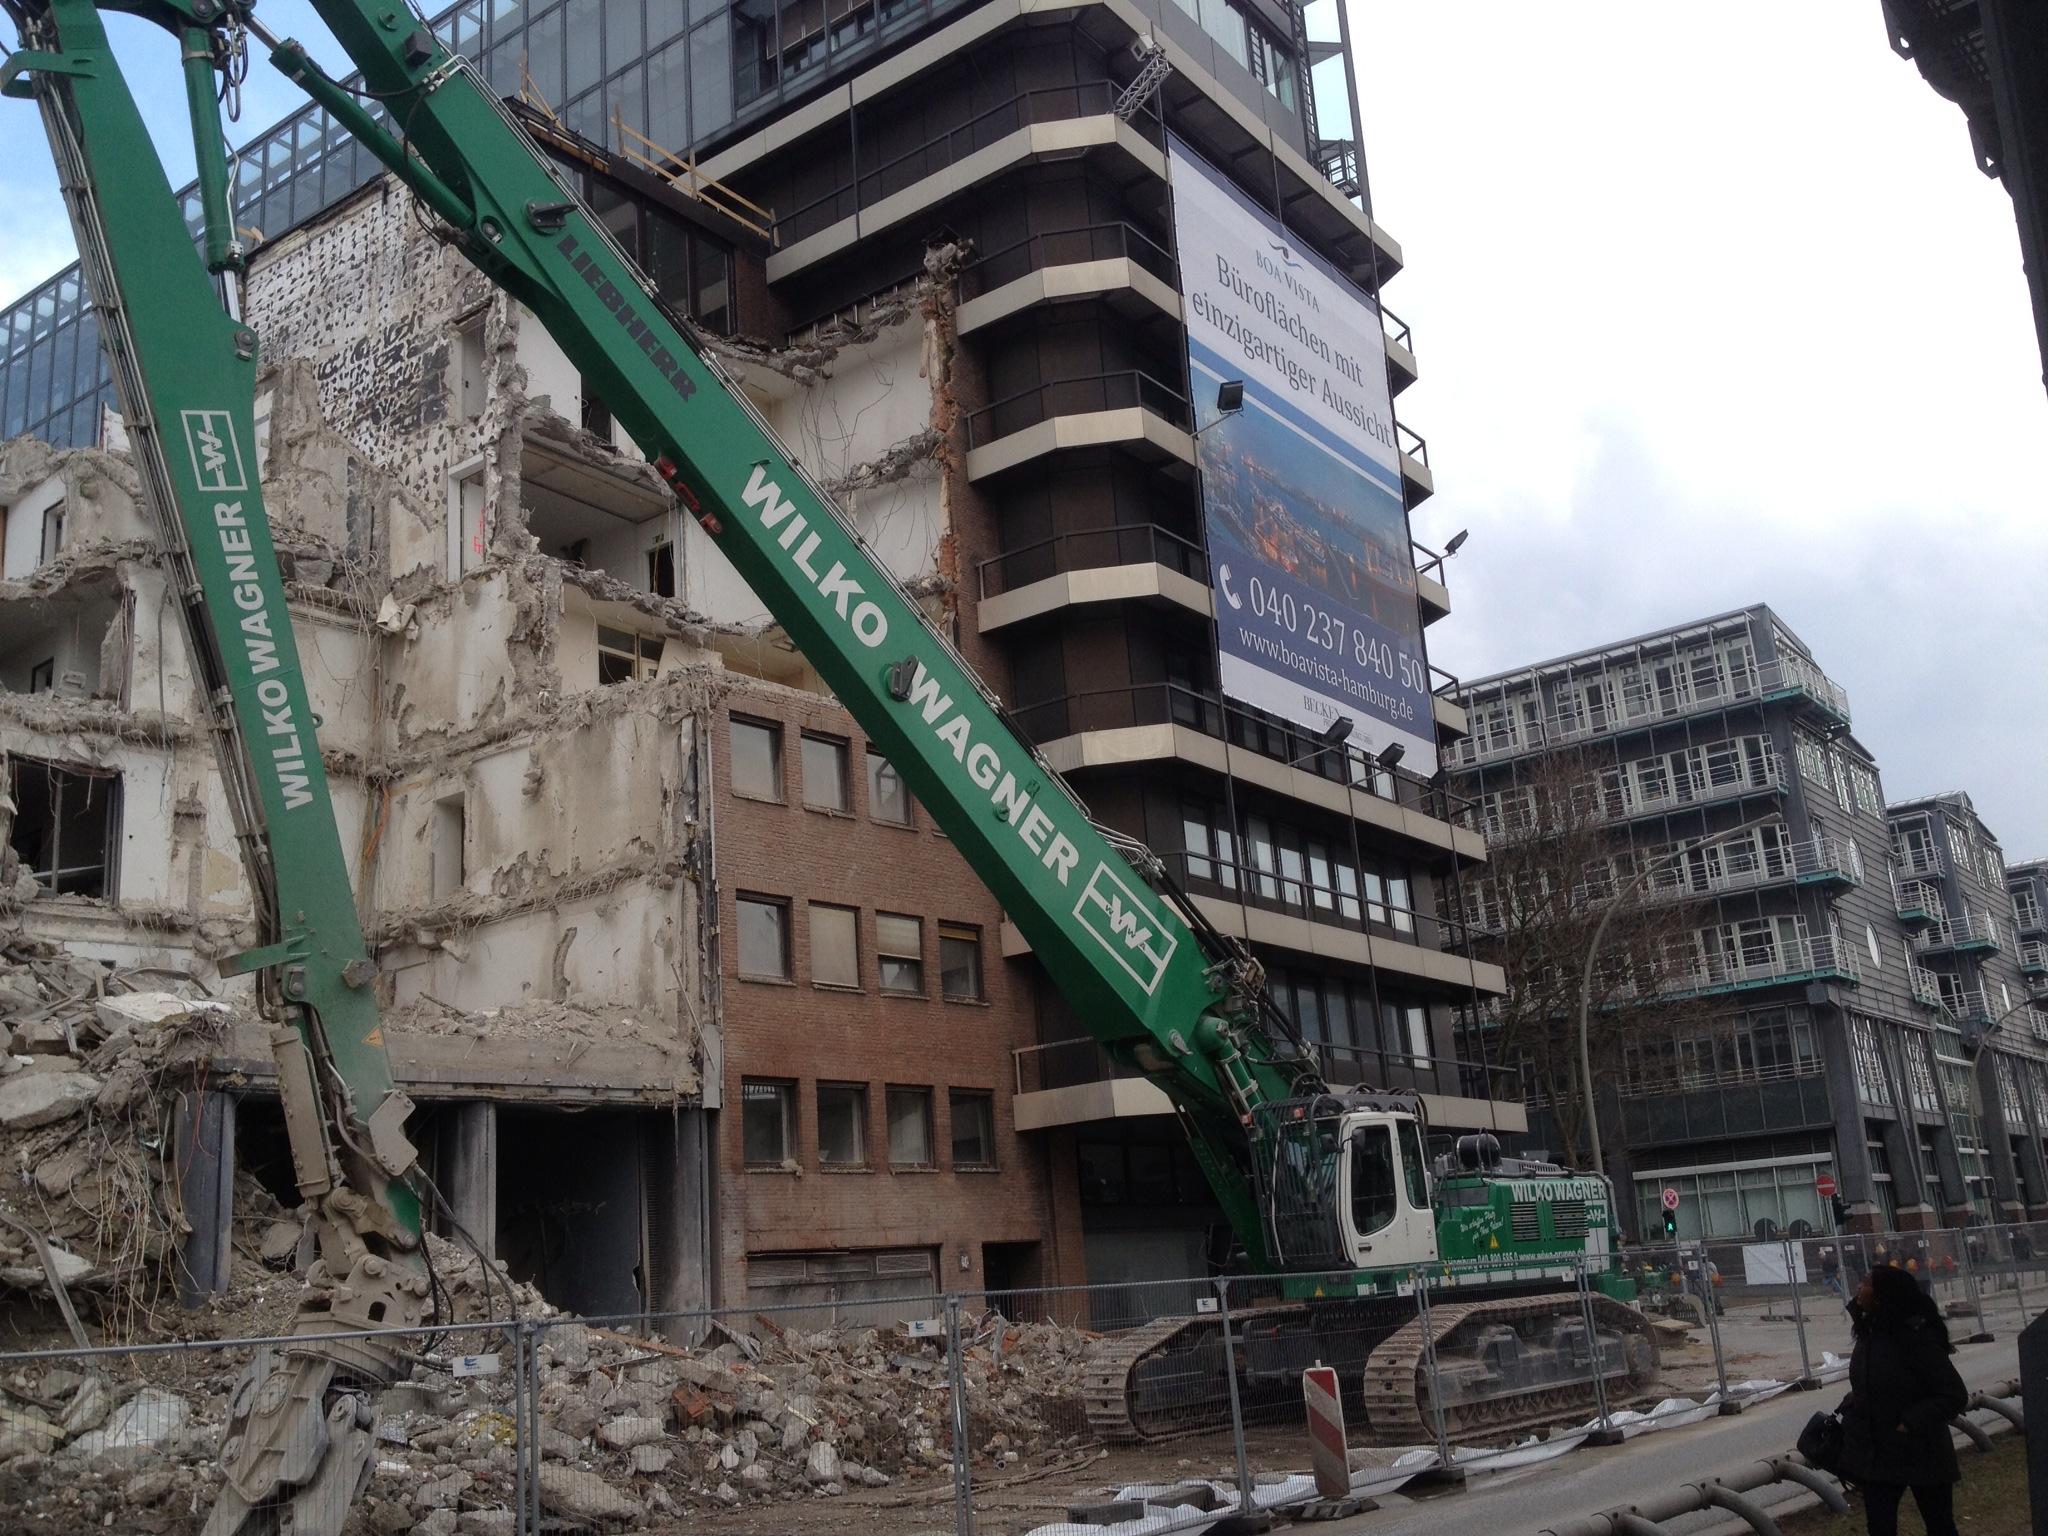 Baufirmen Hamburg wilko wagner abbruch gmbh hamburg seite 5 baufirmen